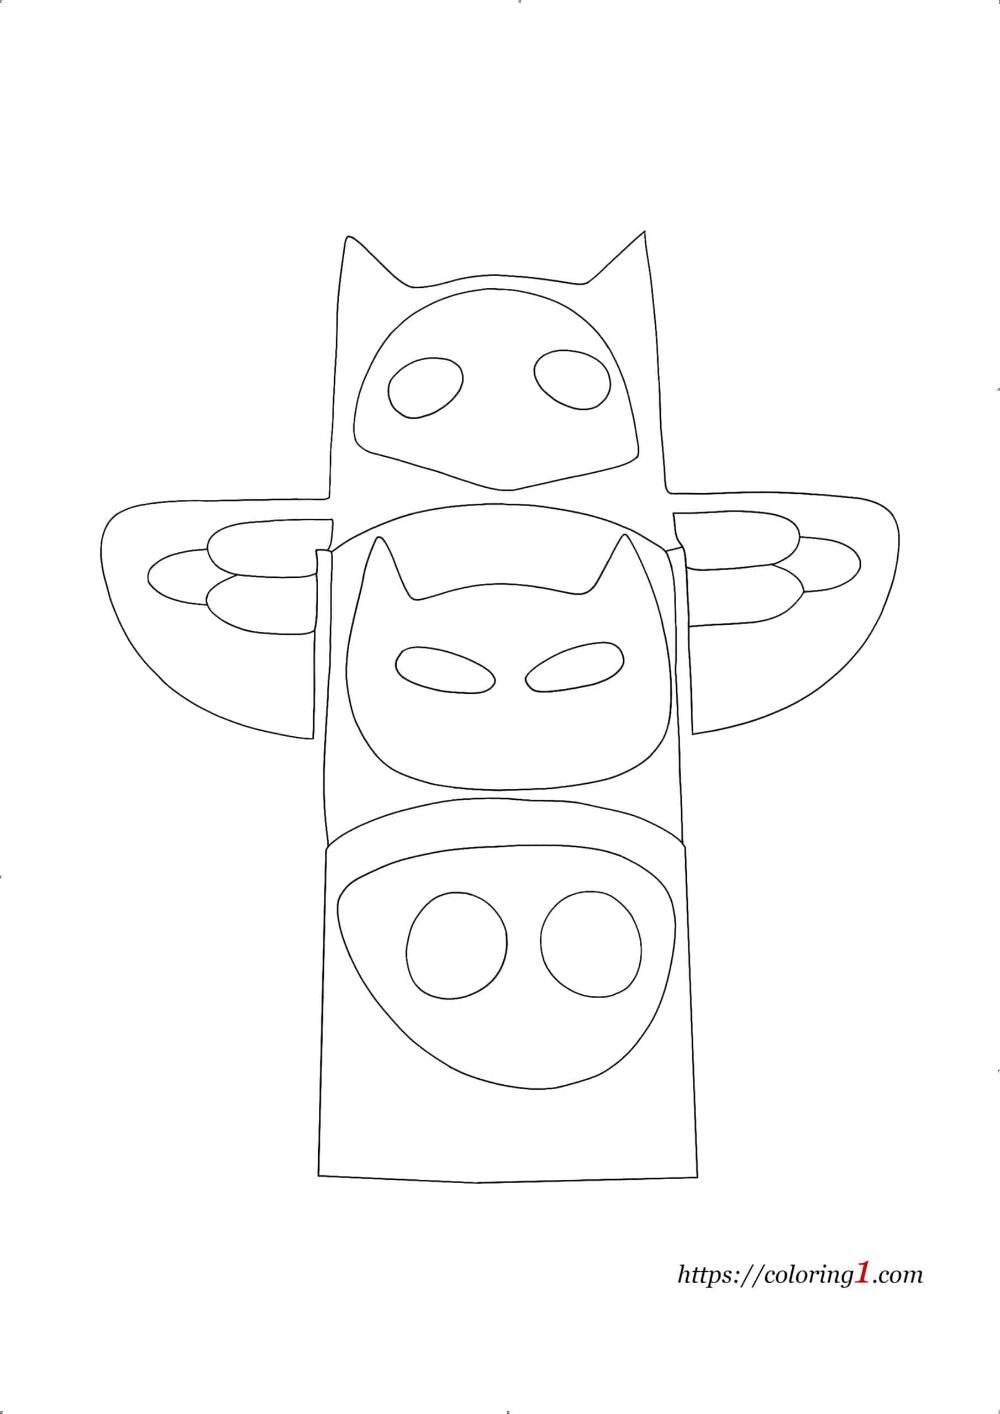 e99363d54992d9838bc859c266a7d126 » Christmas Color Pages Easy To Draw Pj Masks